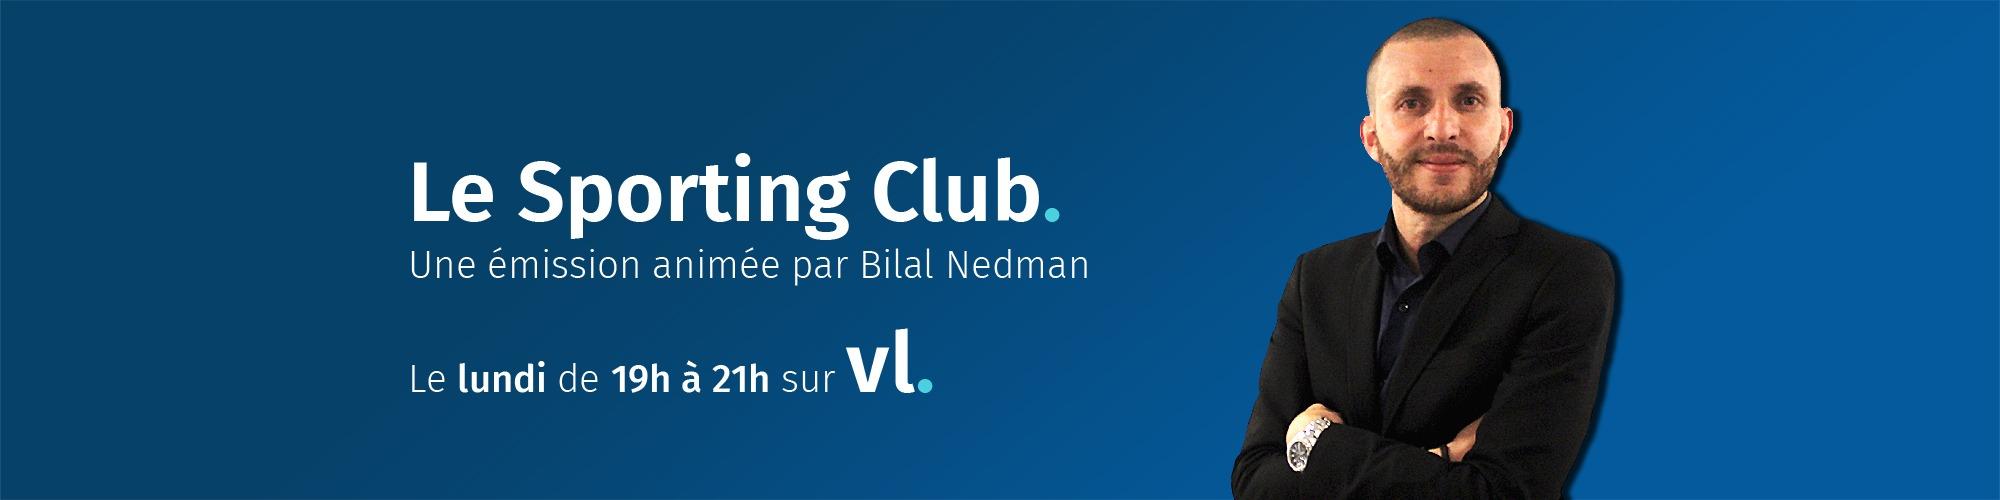 Le Sporting Club sur VL